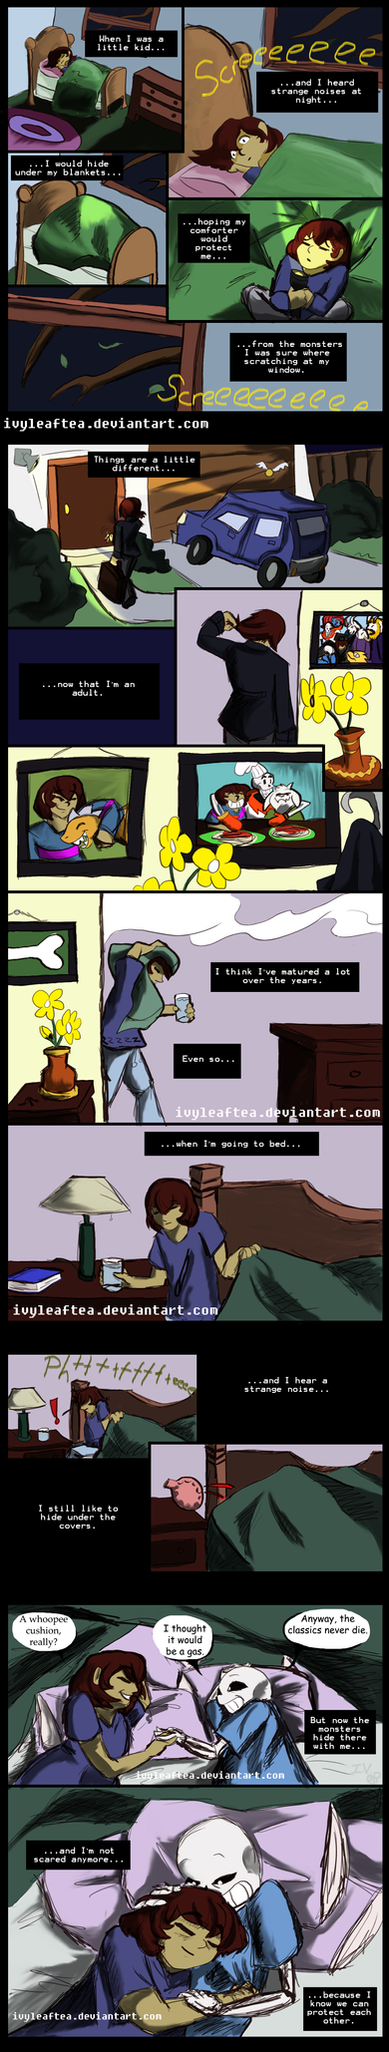 Undertale Comic: Hiding by IvyLeafTea